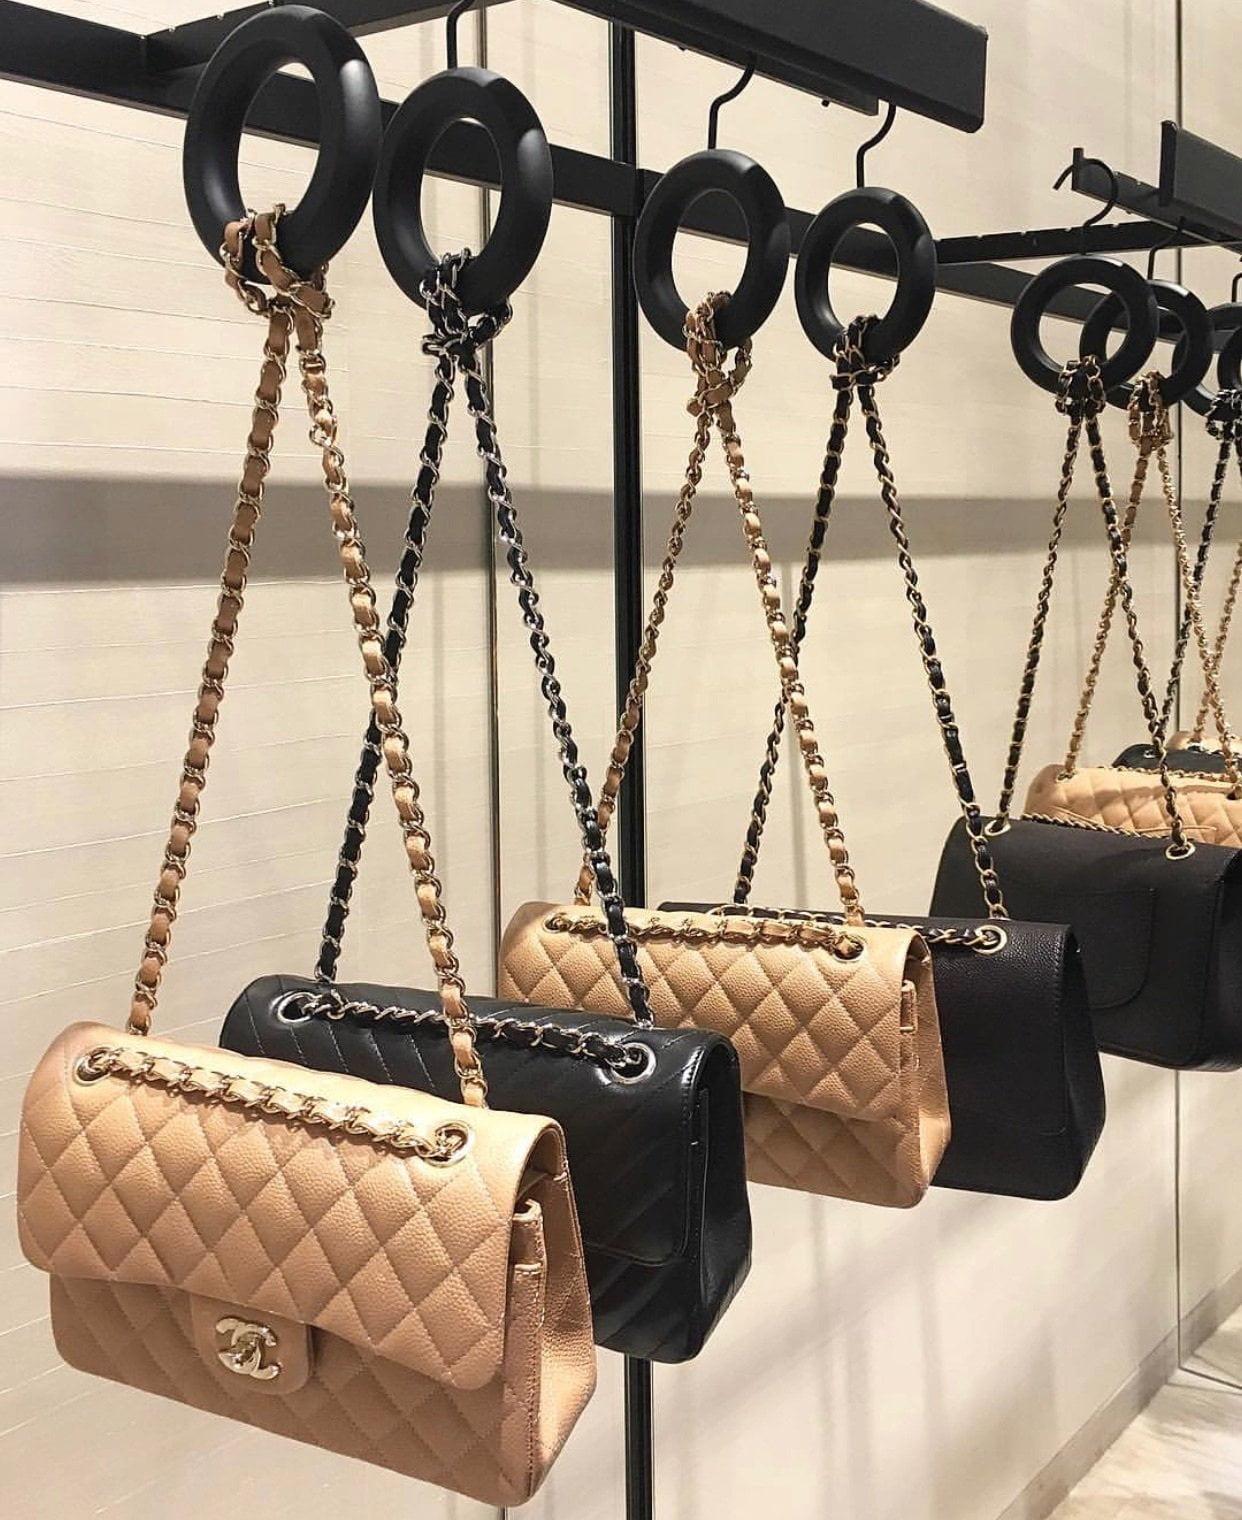 480c2fd8a6d Chanel Pulls Back Its Financial Robe - PurseBop